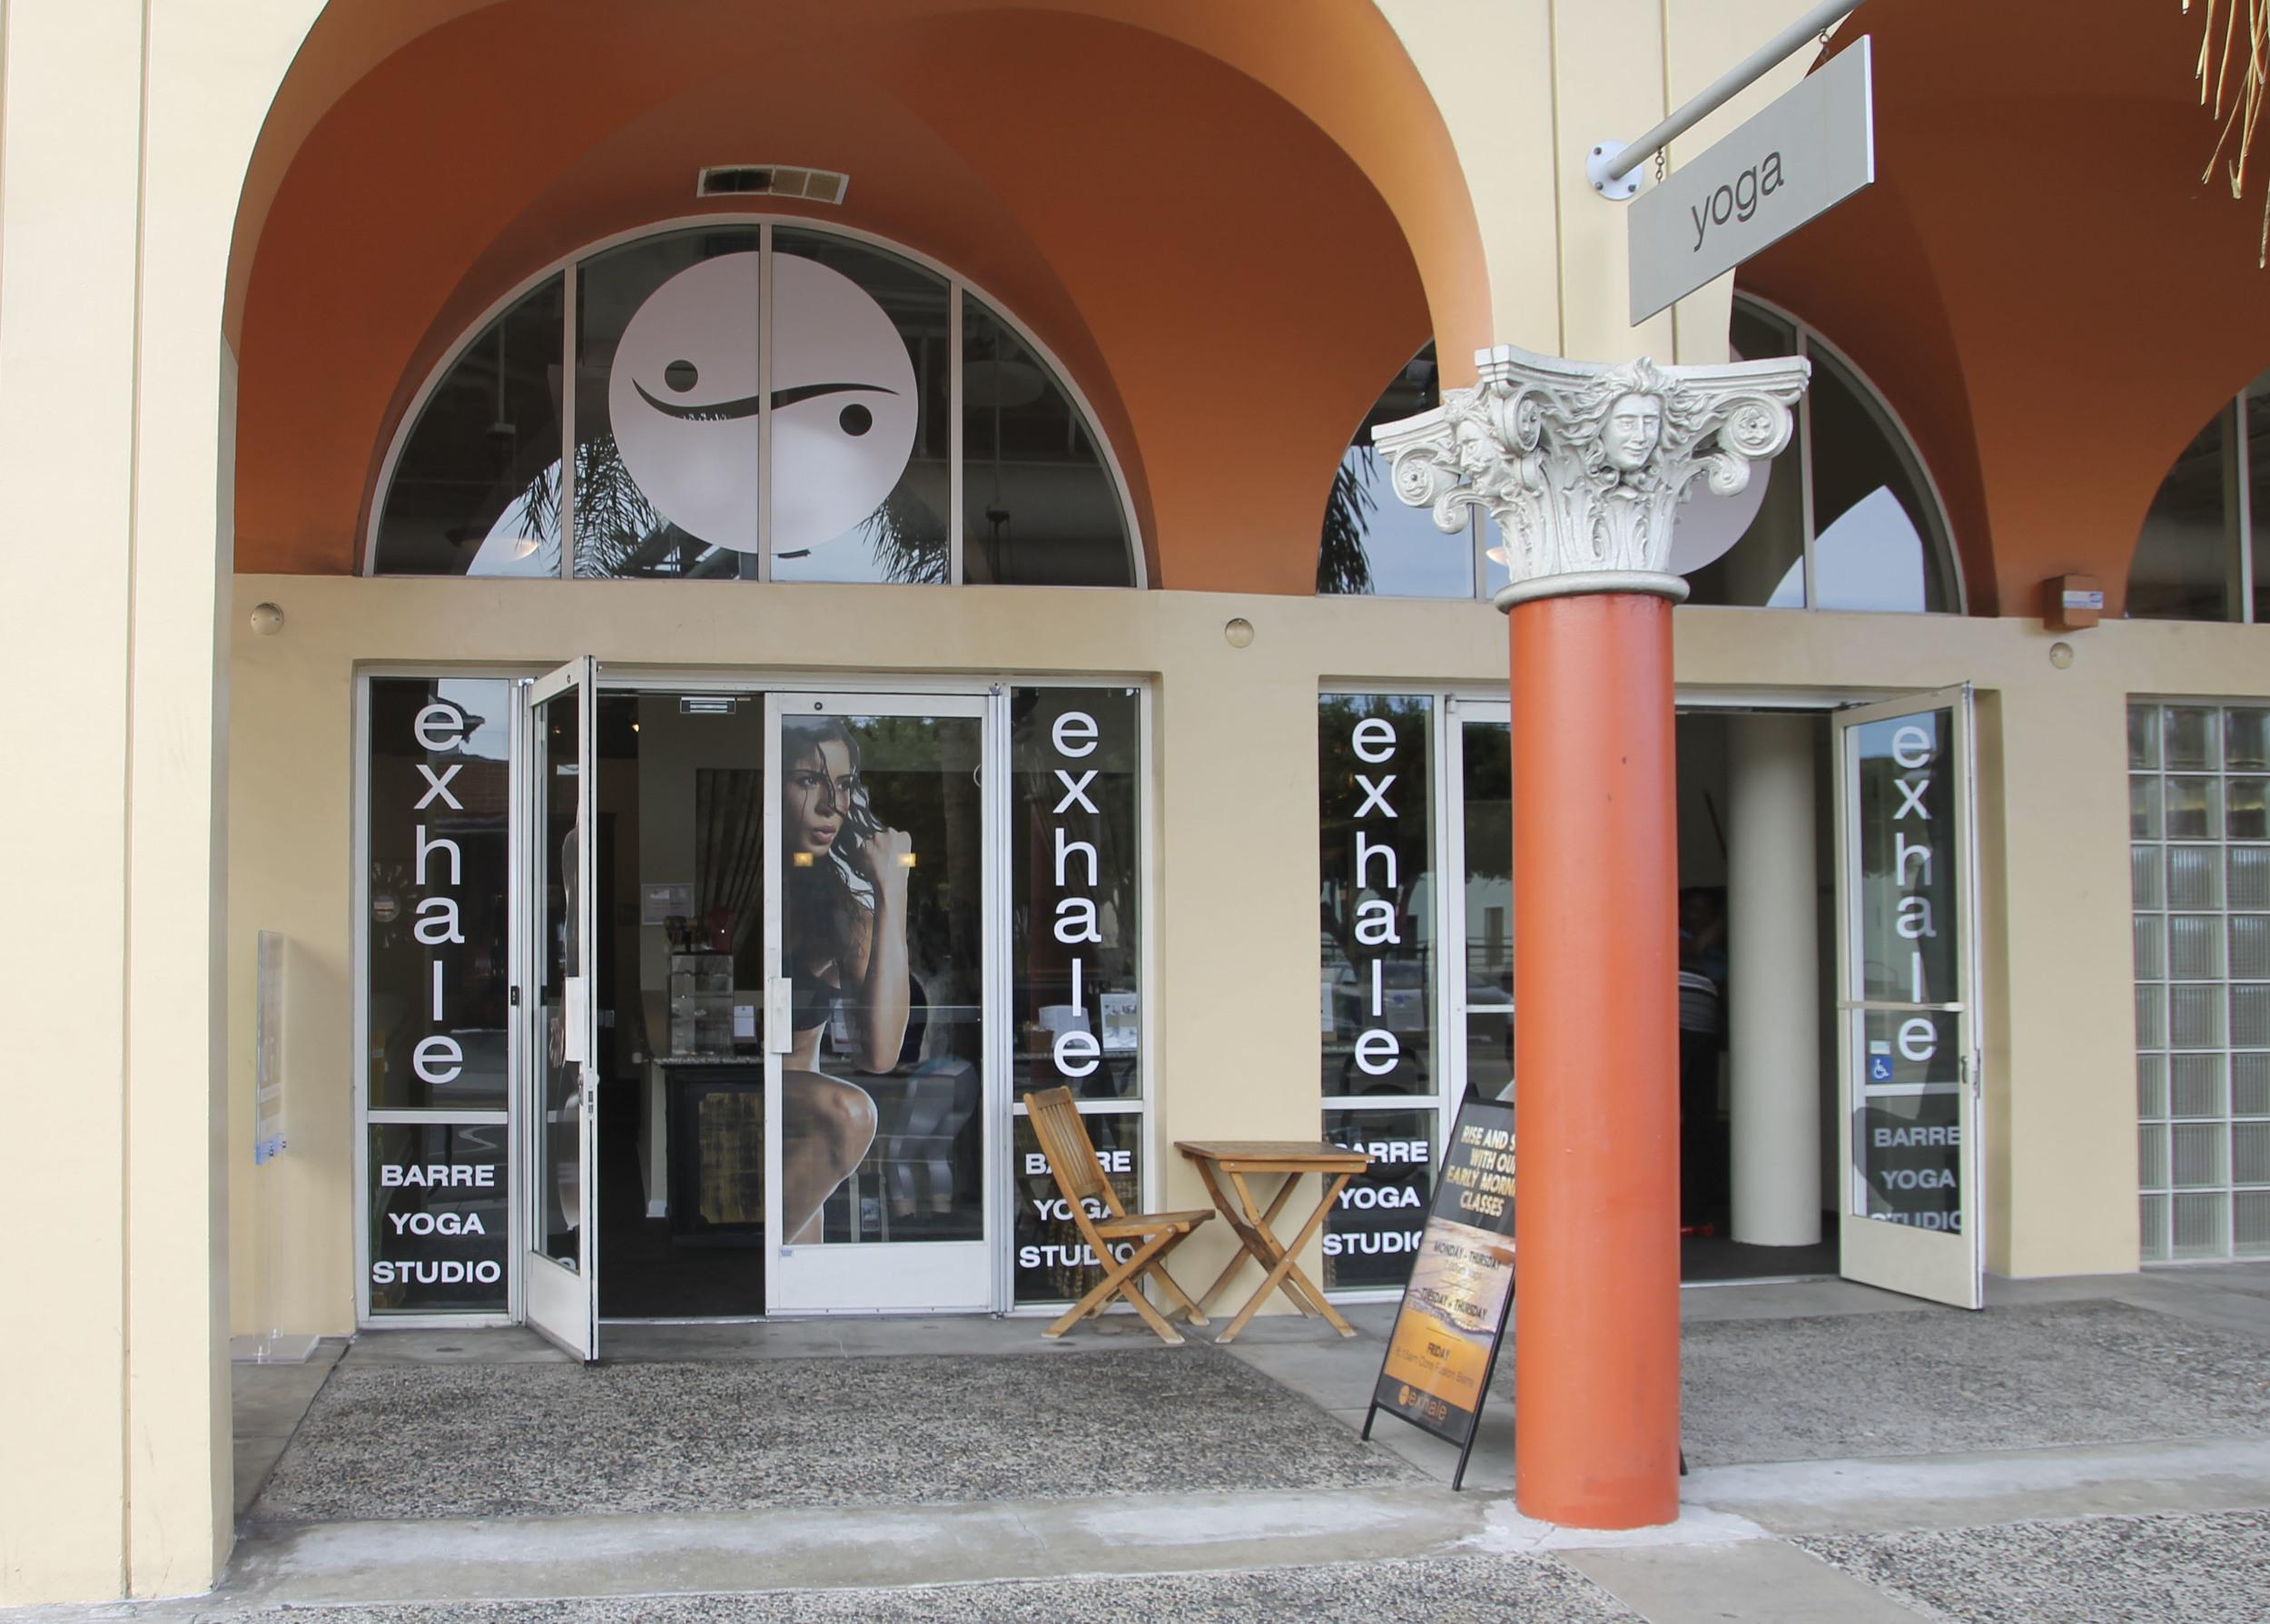 Exhale Yoga Spa Studio Venice California2487.jpg